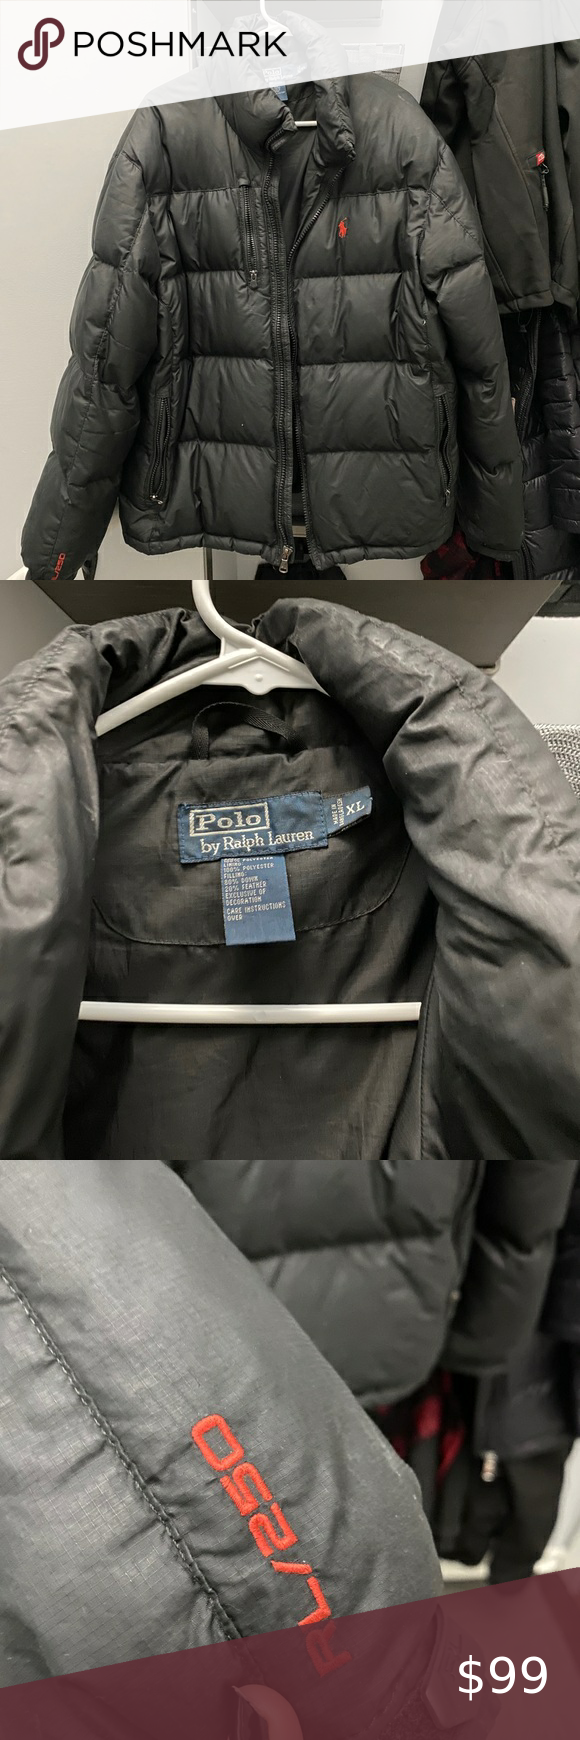 Men S Polo Black Puff Jacket Jackets Winter Jackets Ralph Lauren Jackets [ 1740 x 580 Pixel ]